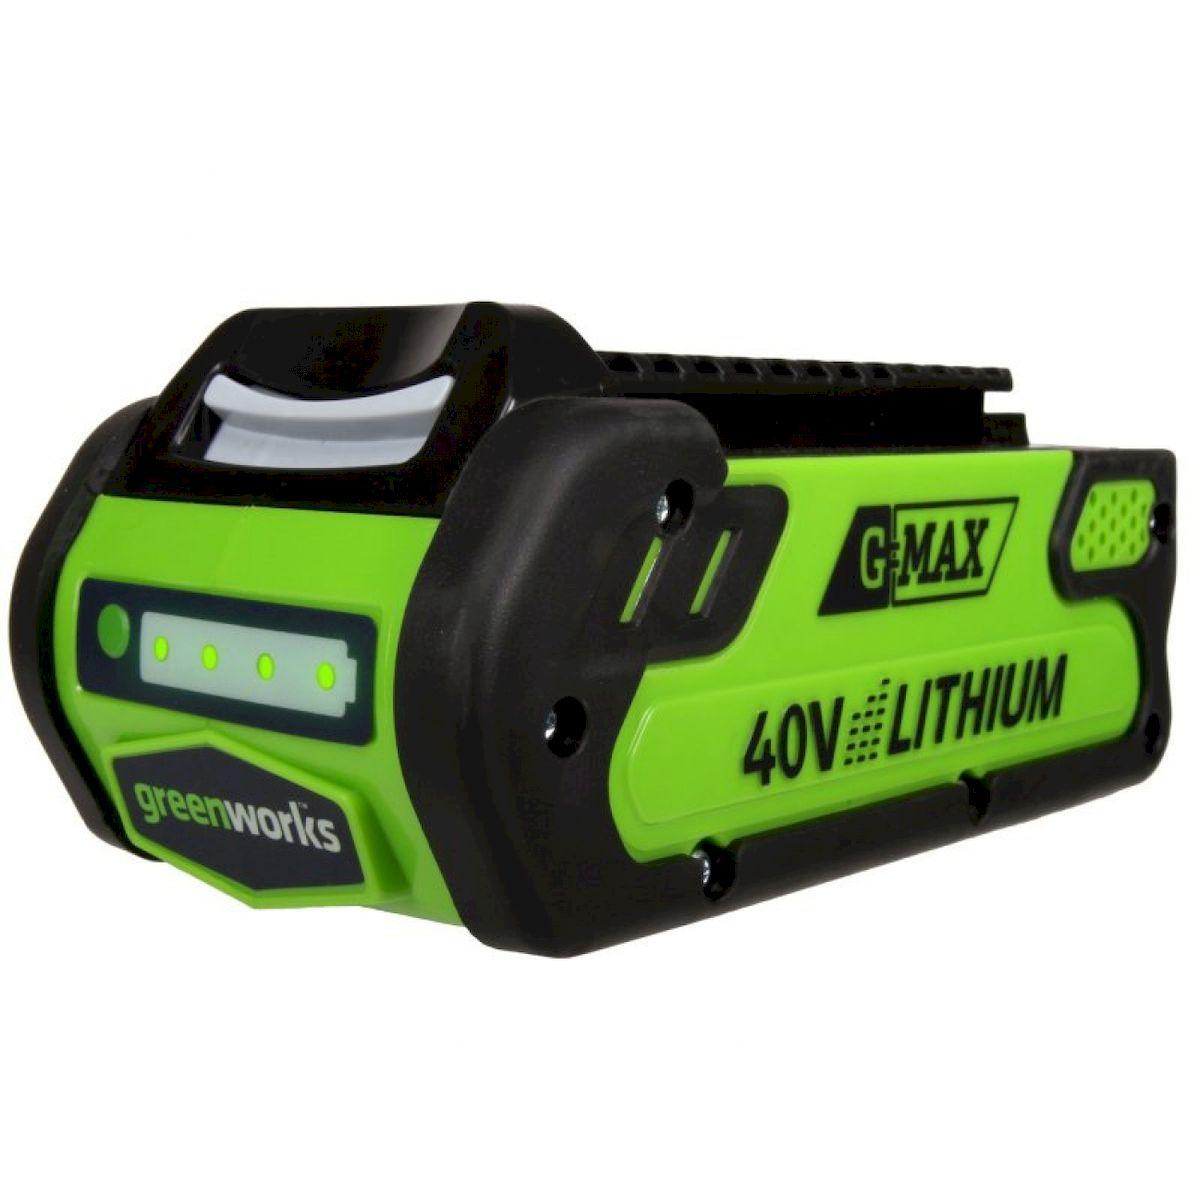 Литий-Ионная аккумуляторная батарея GreenWorks 40В 2Аh ( 29717 )